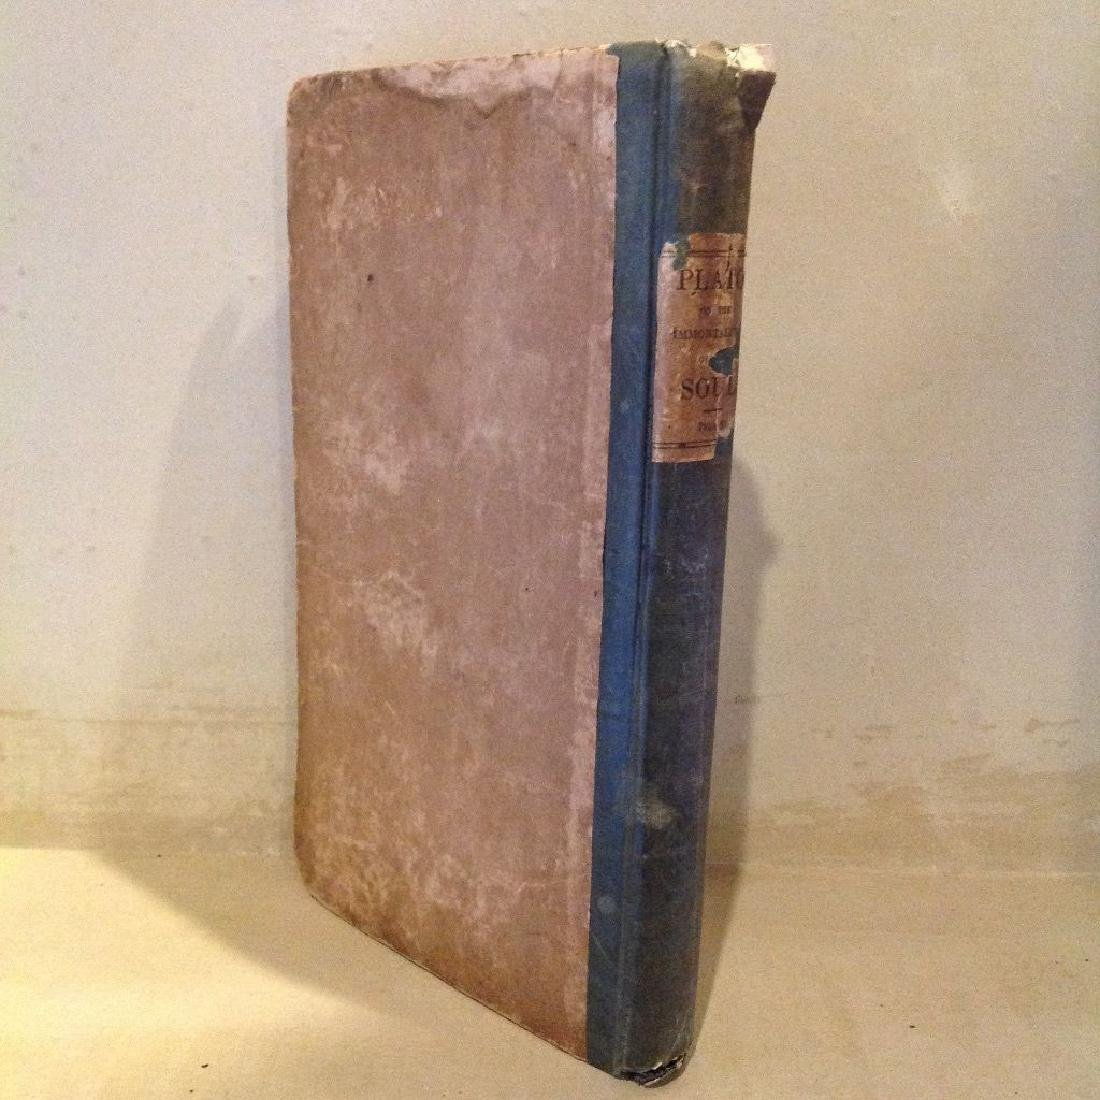 Plato: Phaedon, 1833, 1st Ed - 2